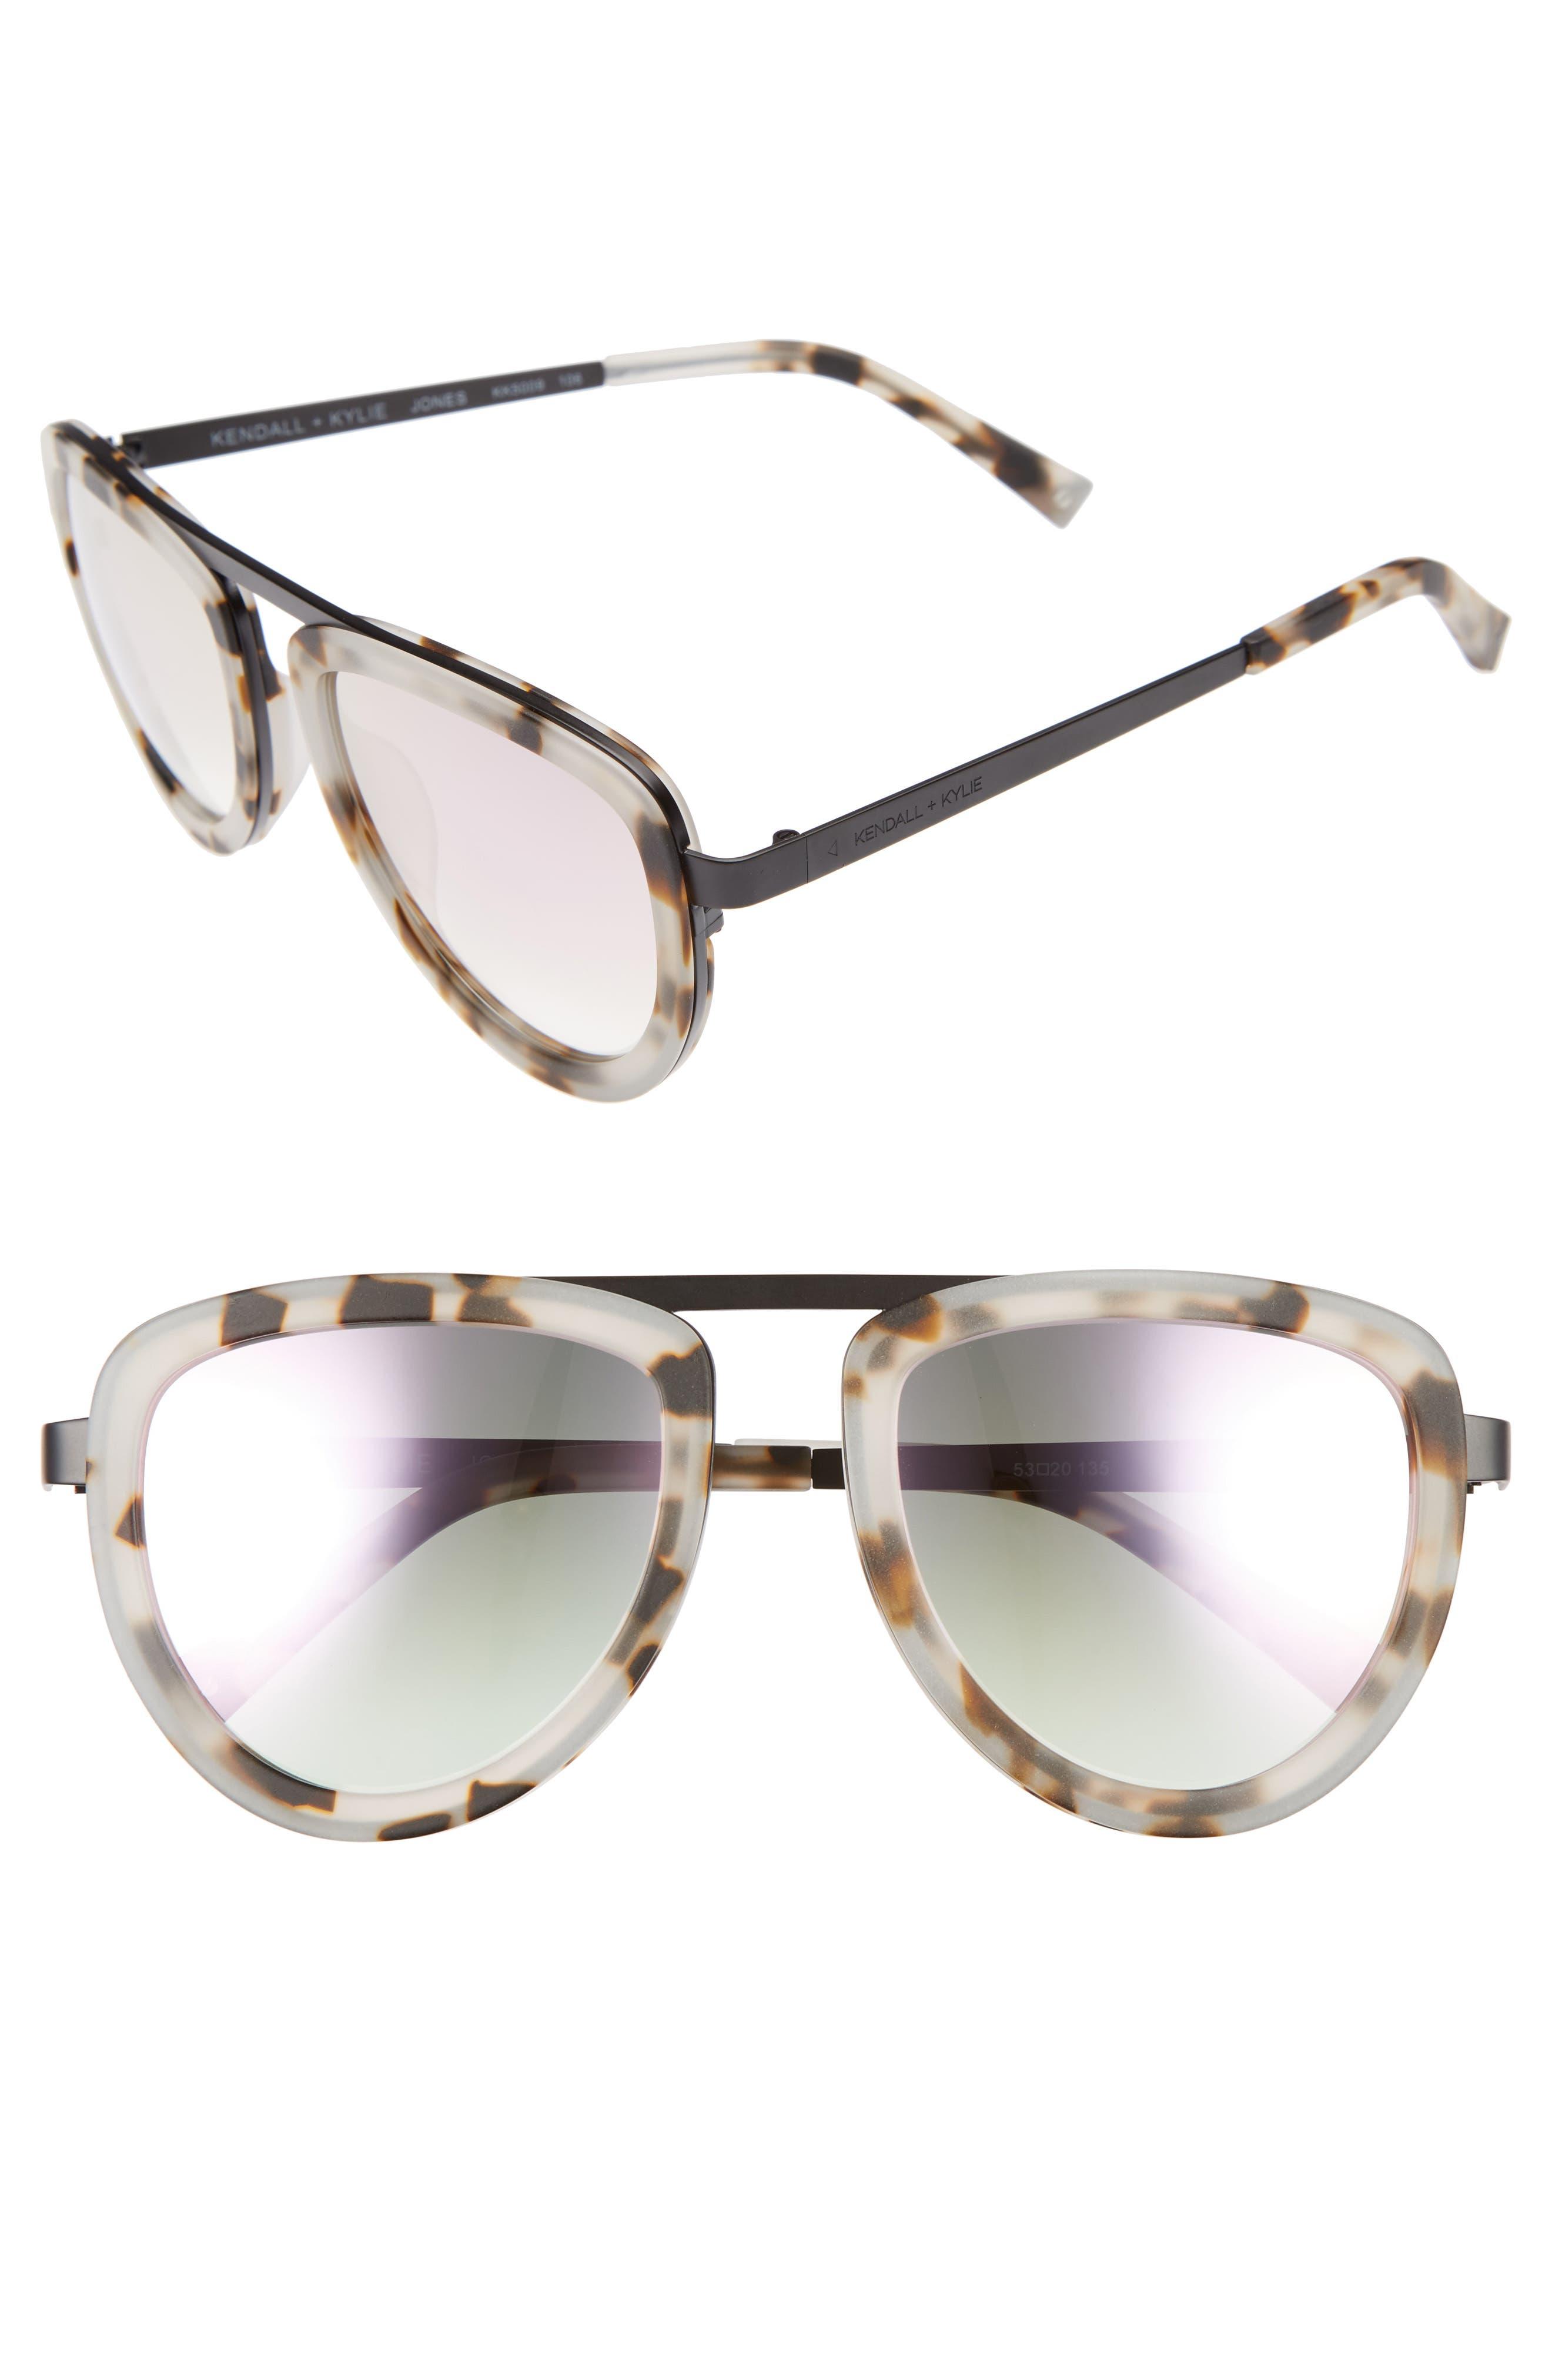 KENDALL + KYLIE 53mm Aviator Sunglasses